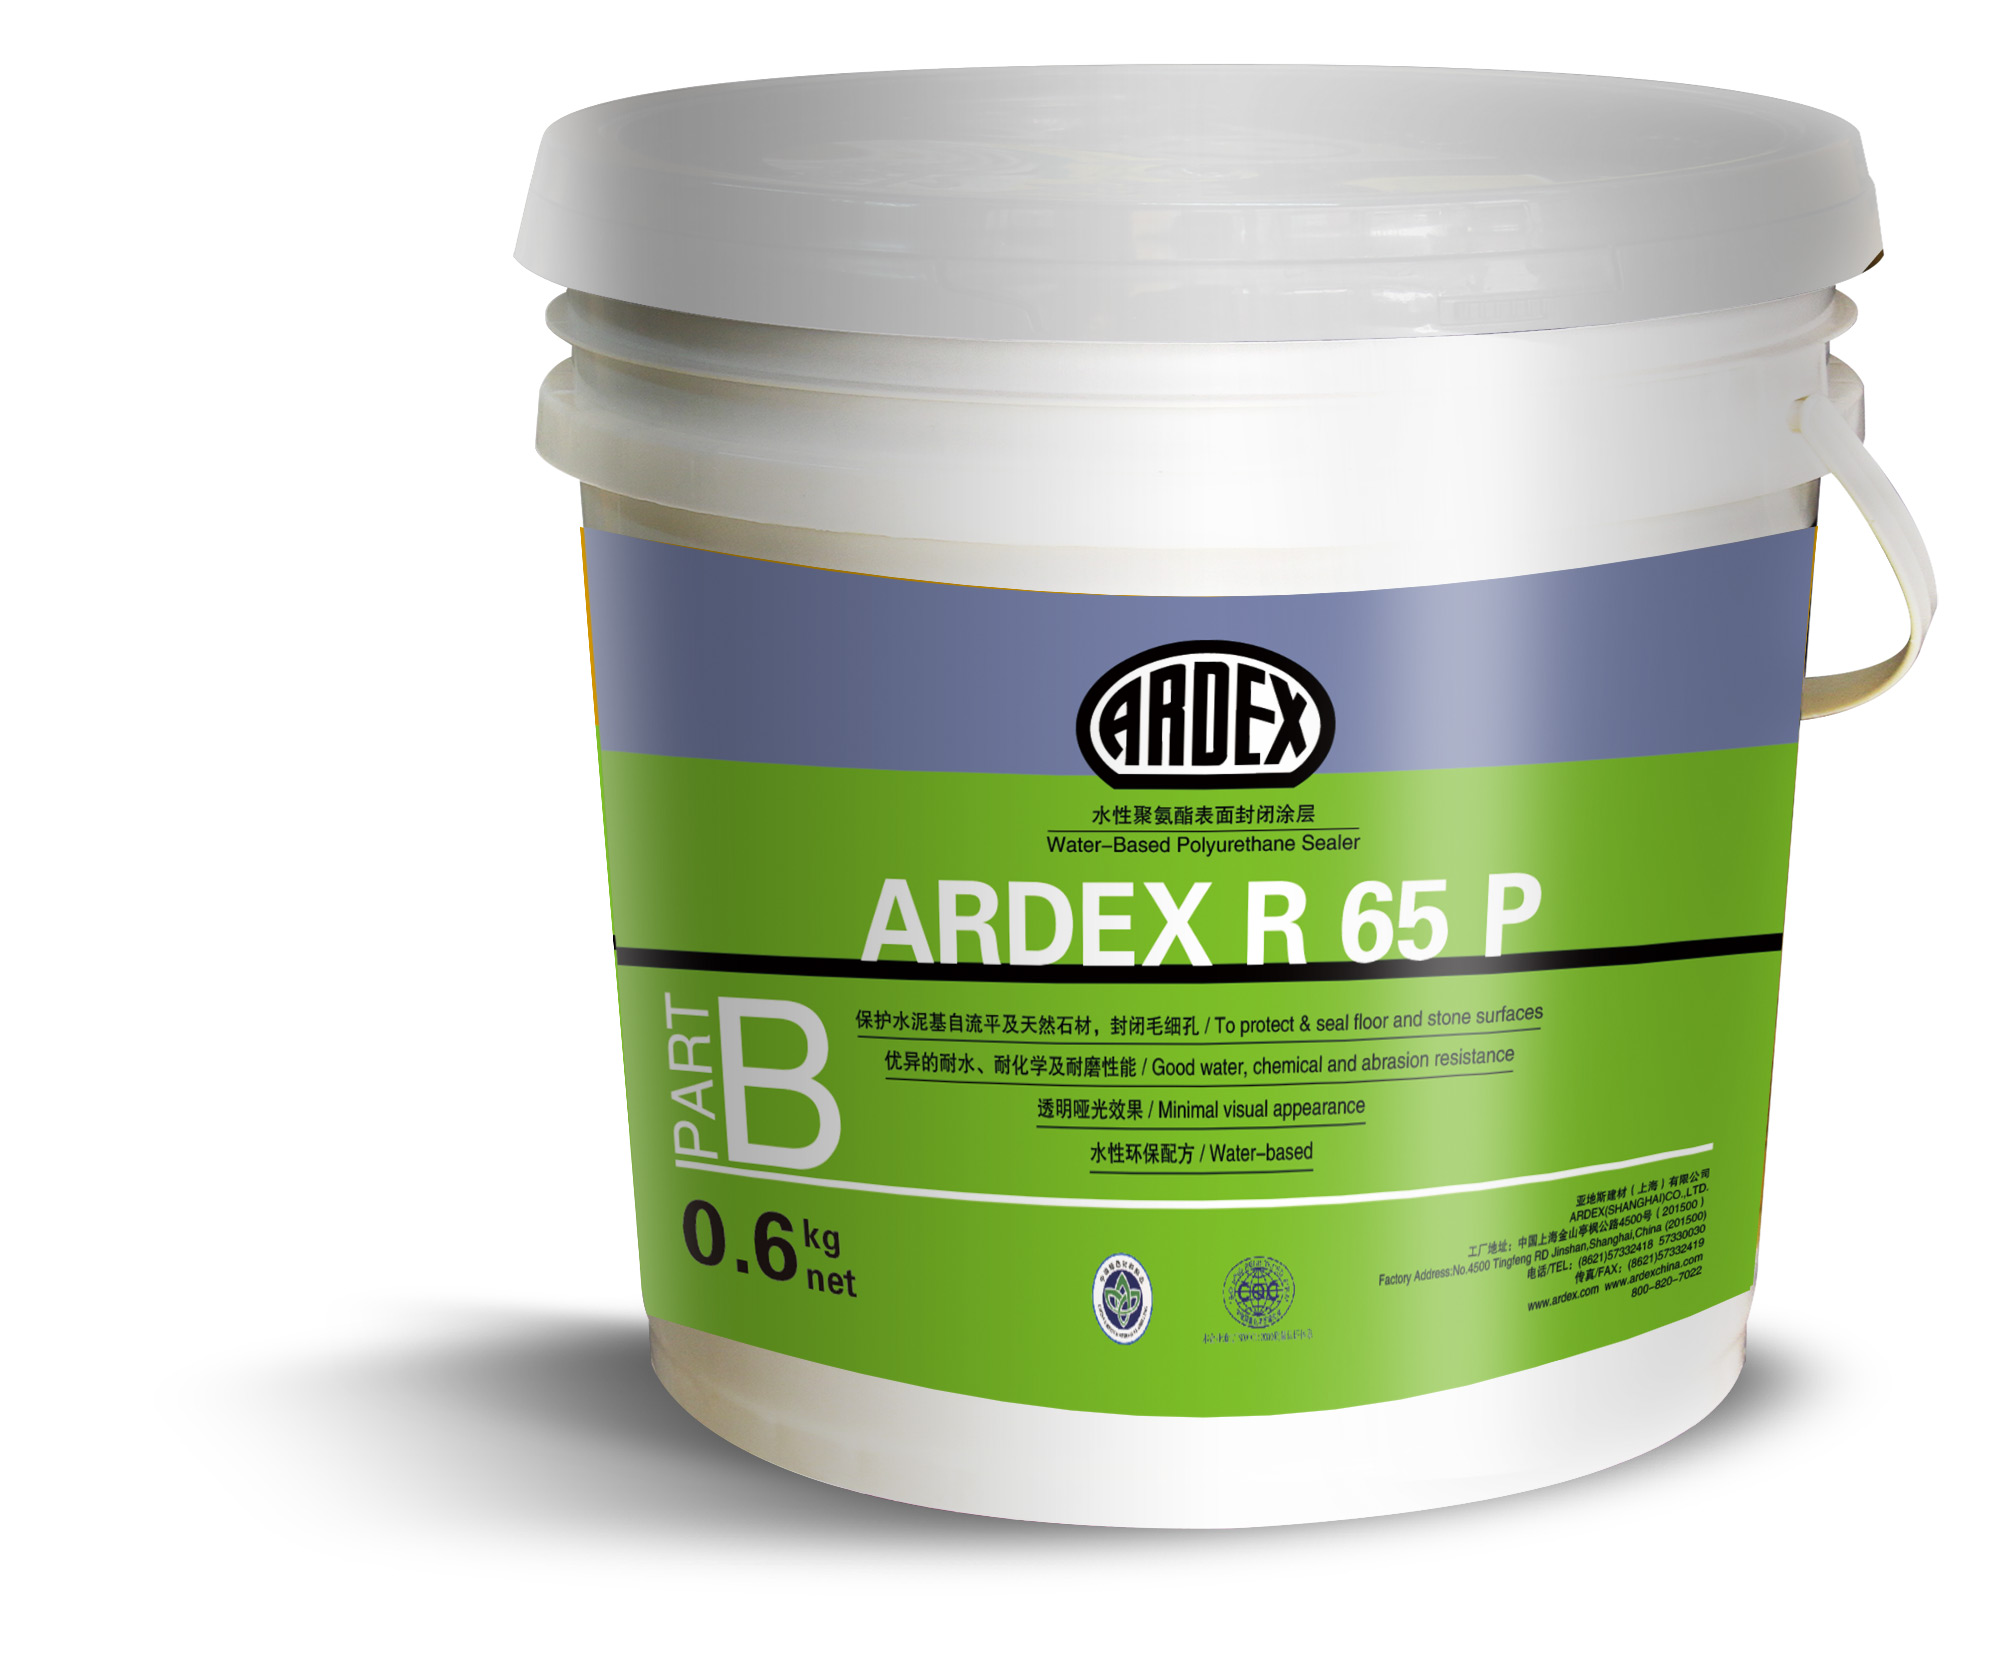 ARDEX R 65 P